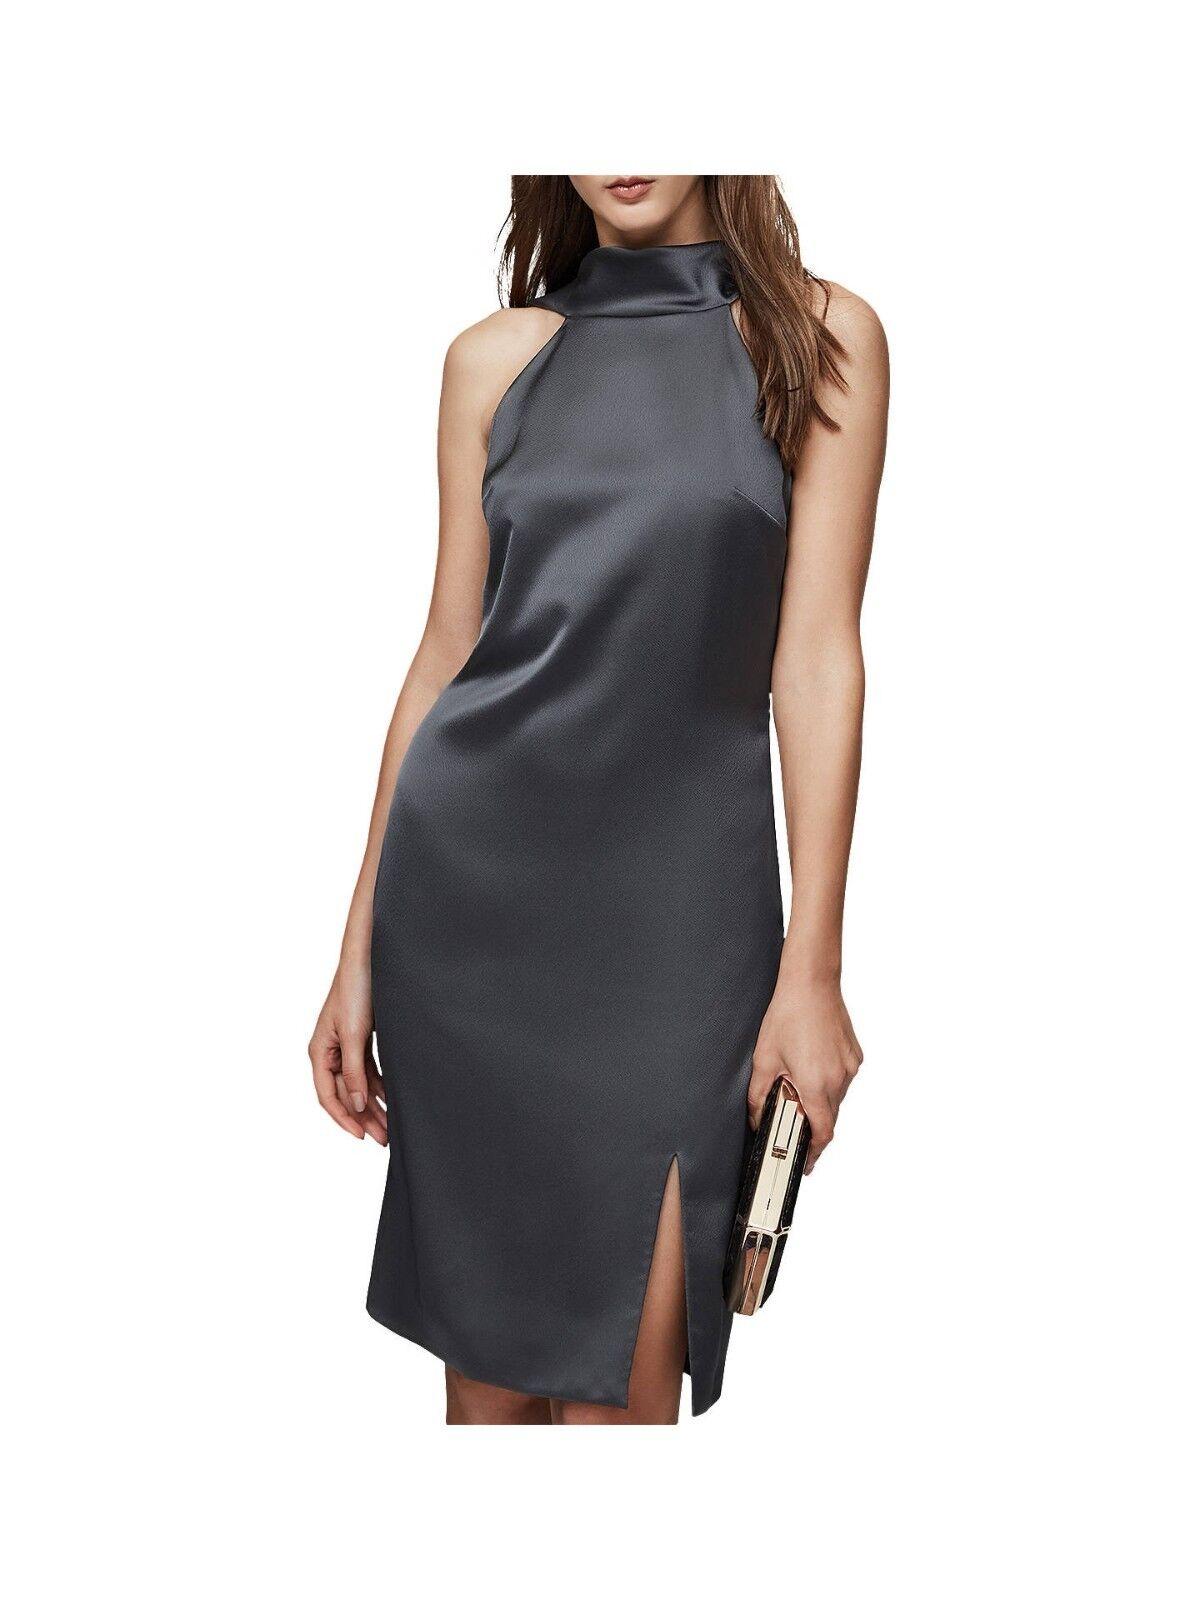 Reiss Mina grau High Neck Fluid Drape Cowl Back Cocktail Party Dress